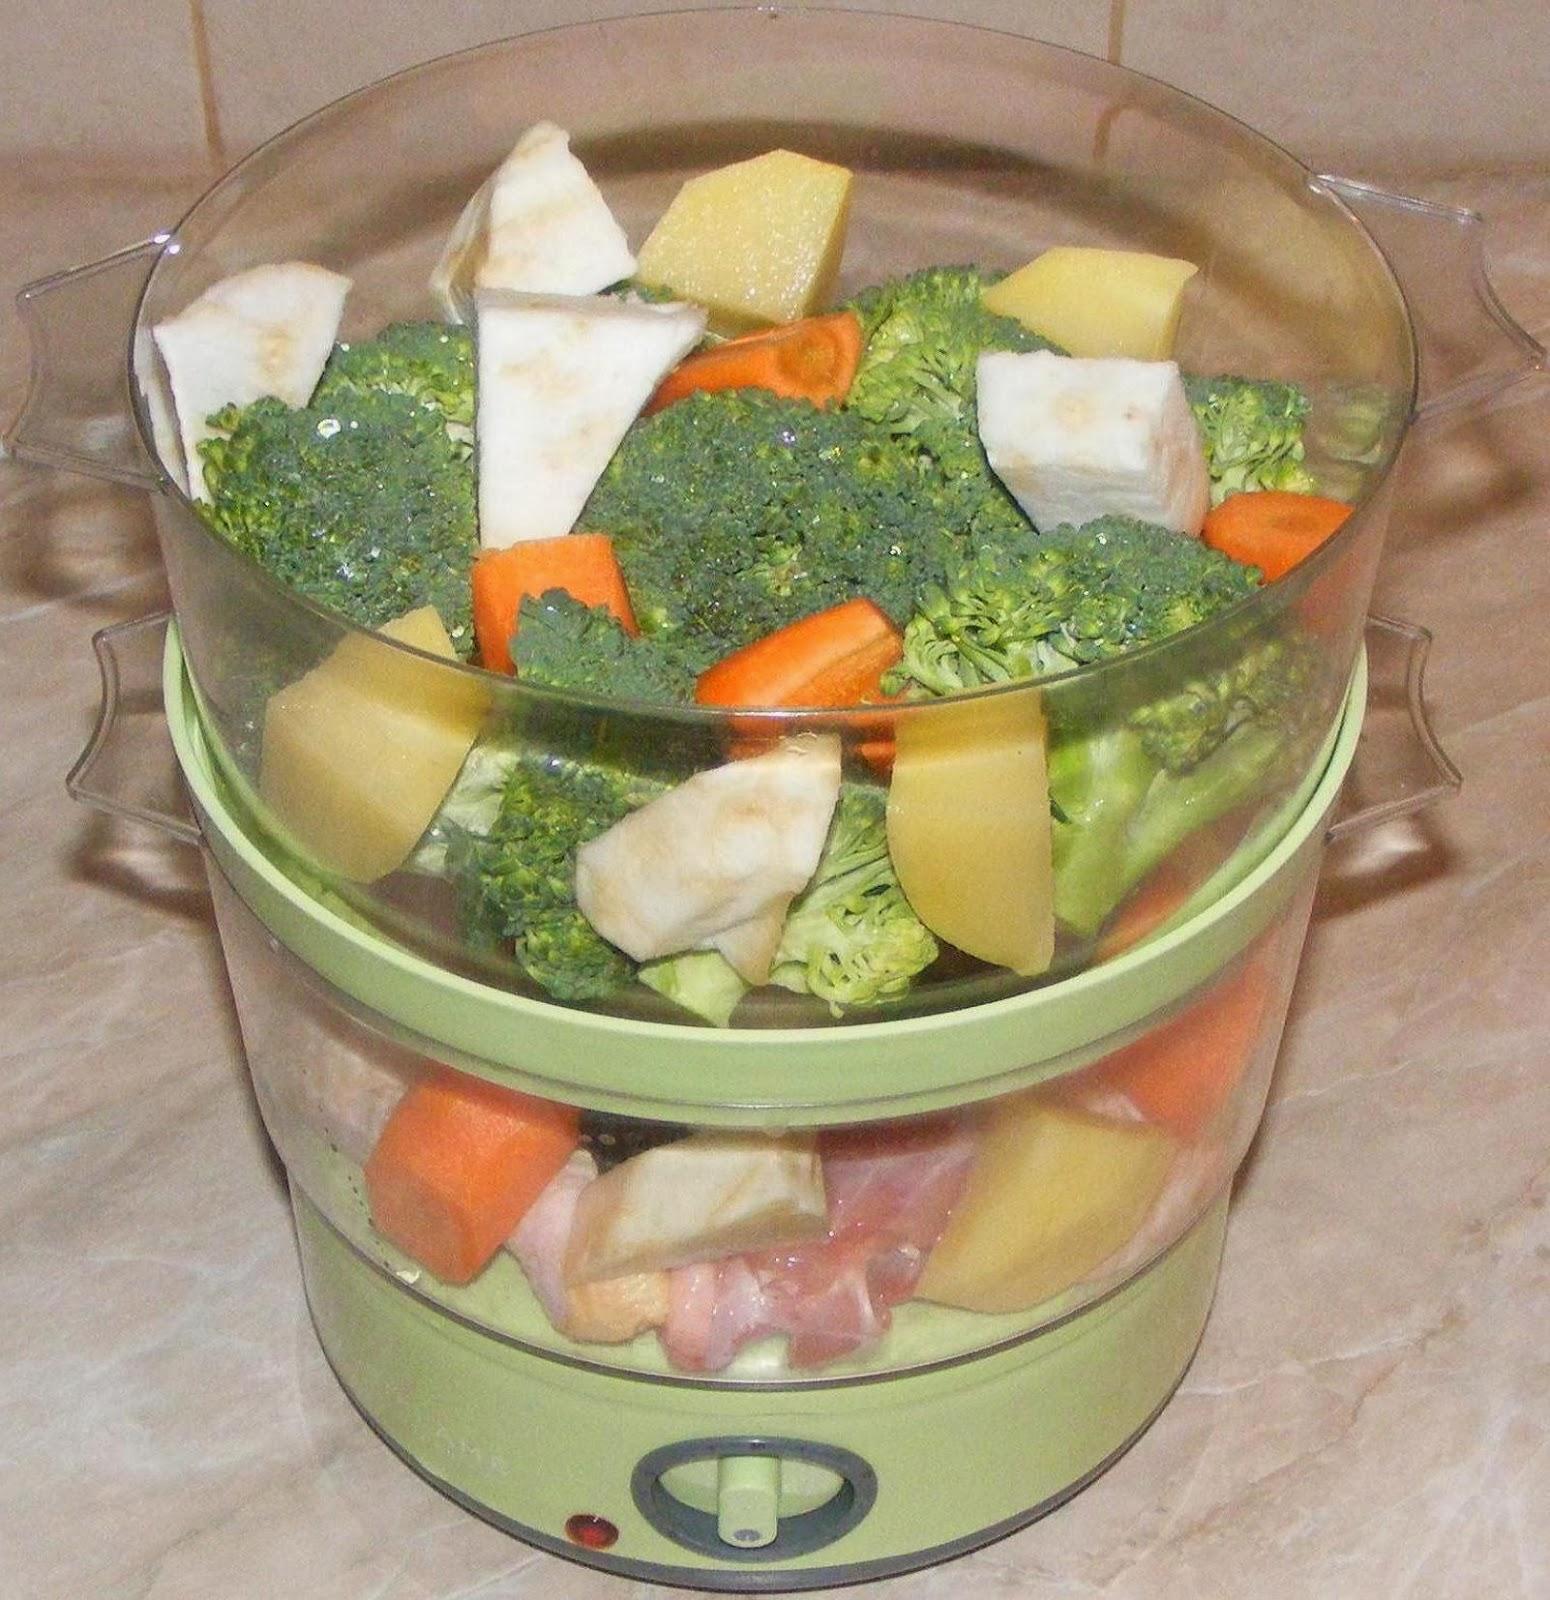 retete cu pui, retete cu broccoli, retete de mancare, broccoli, retete culinare, preparate culinare, pui cu broccoli, pui cu broccoli preparat la aburi, retete dietetice, retete usoare,retete rapide, mancare cu broccoli,